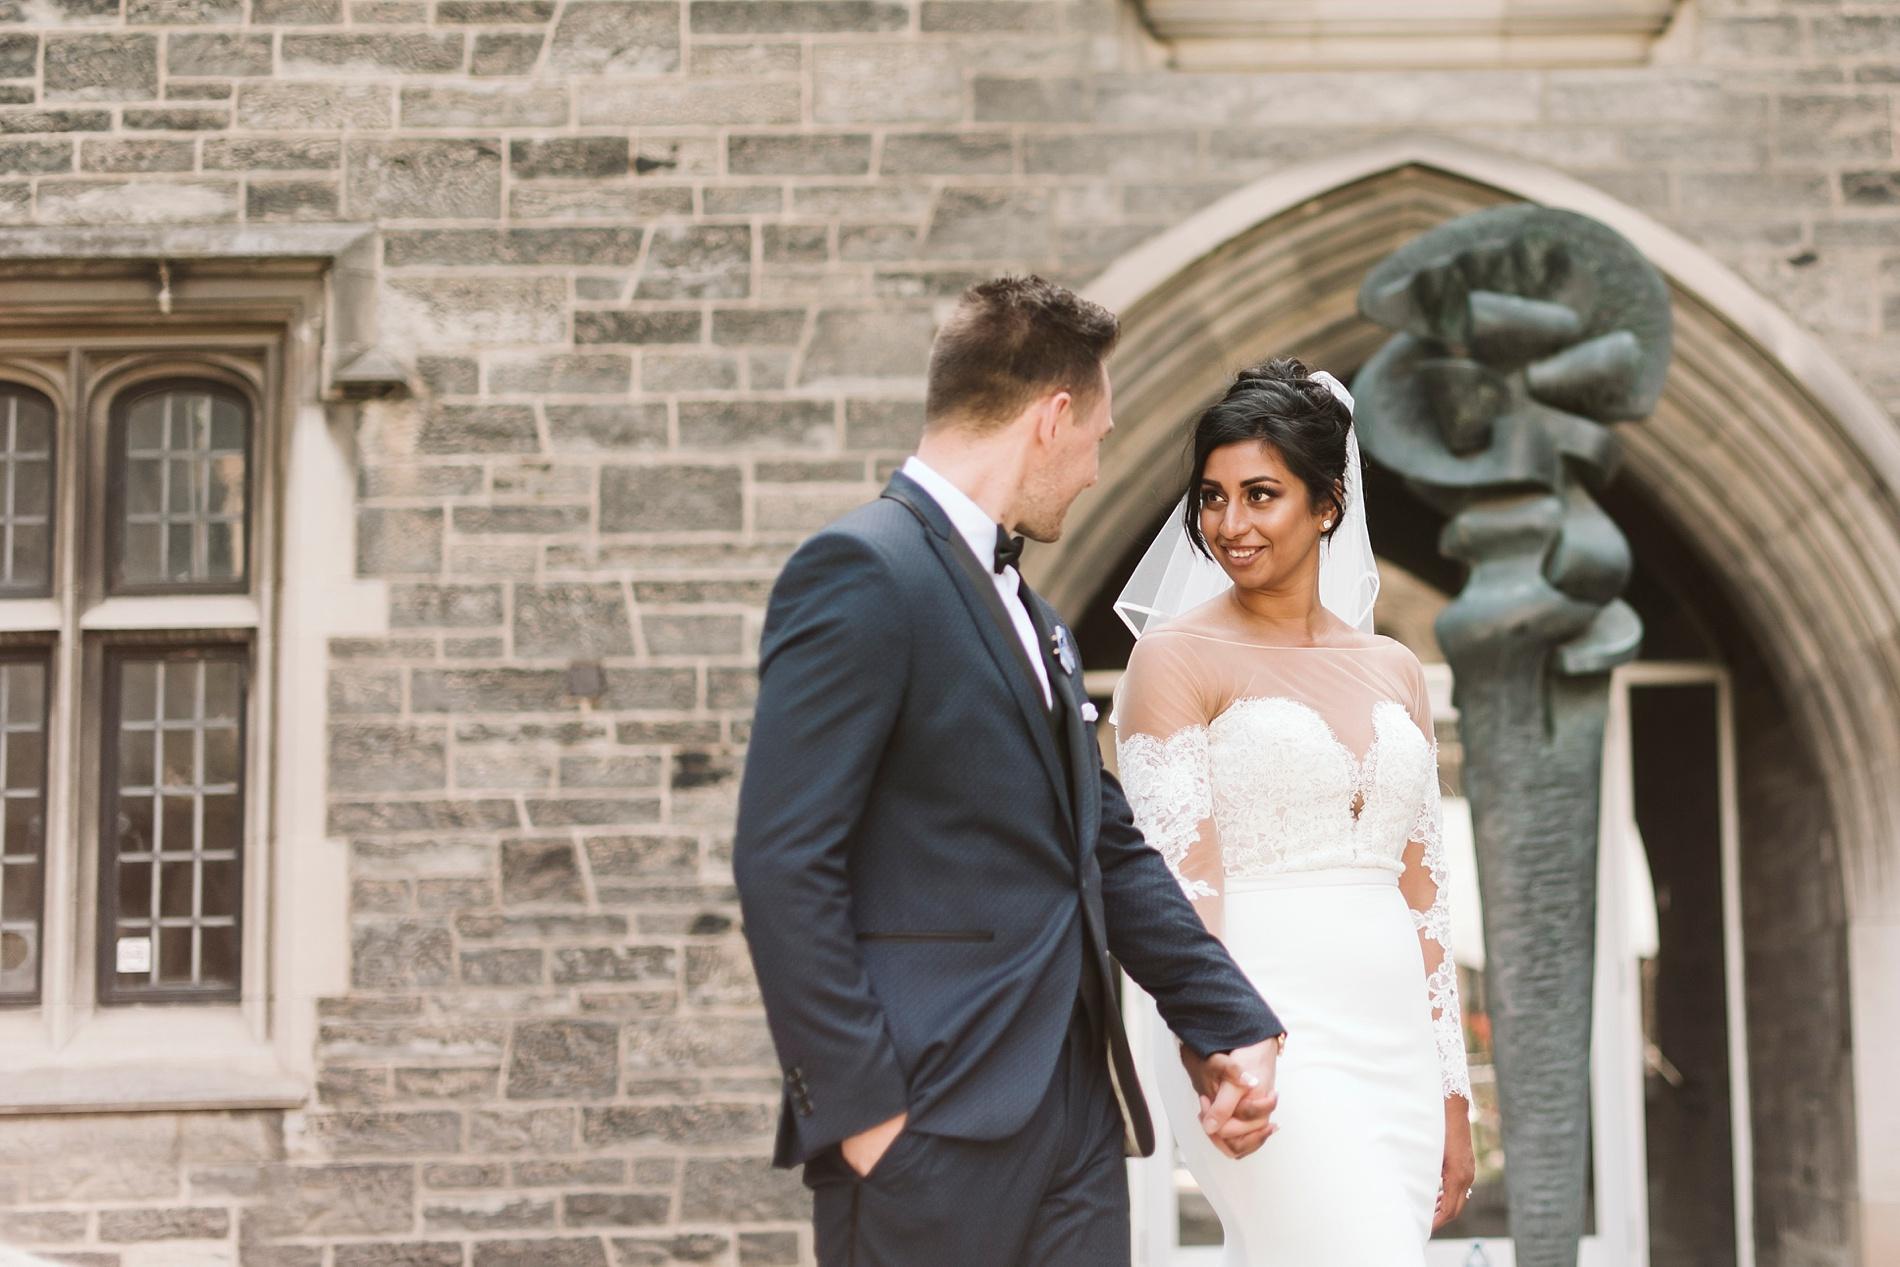 Eglington_Grand_Wedding_Photographer_0054.jpg